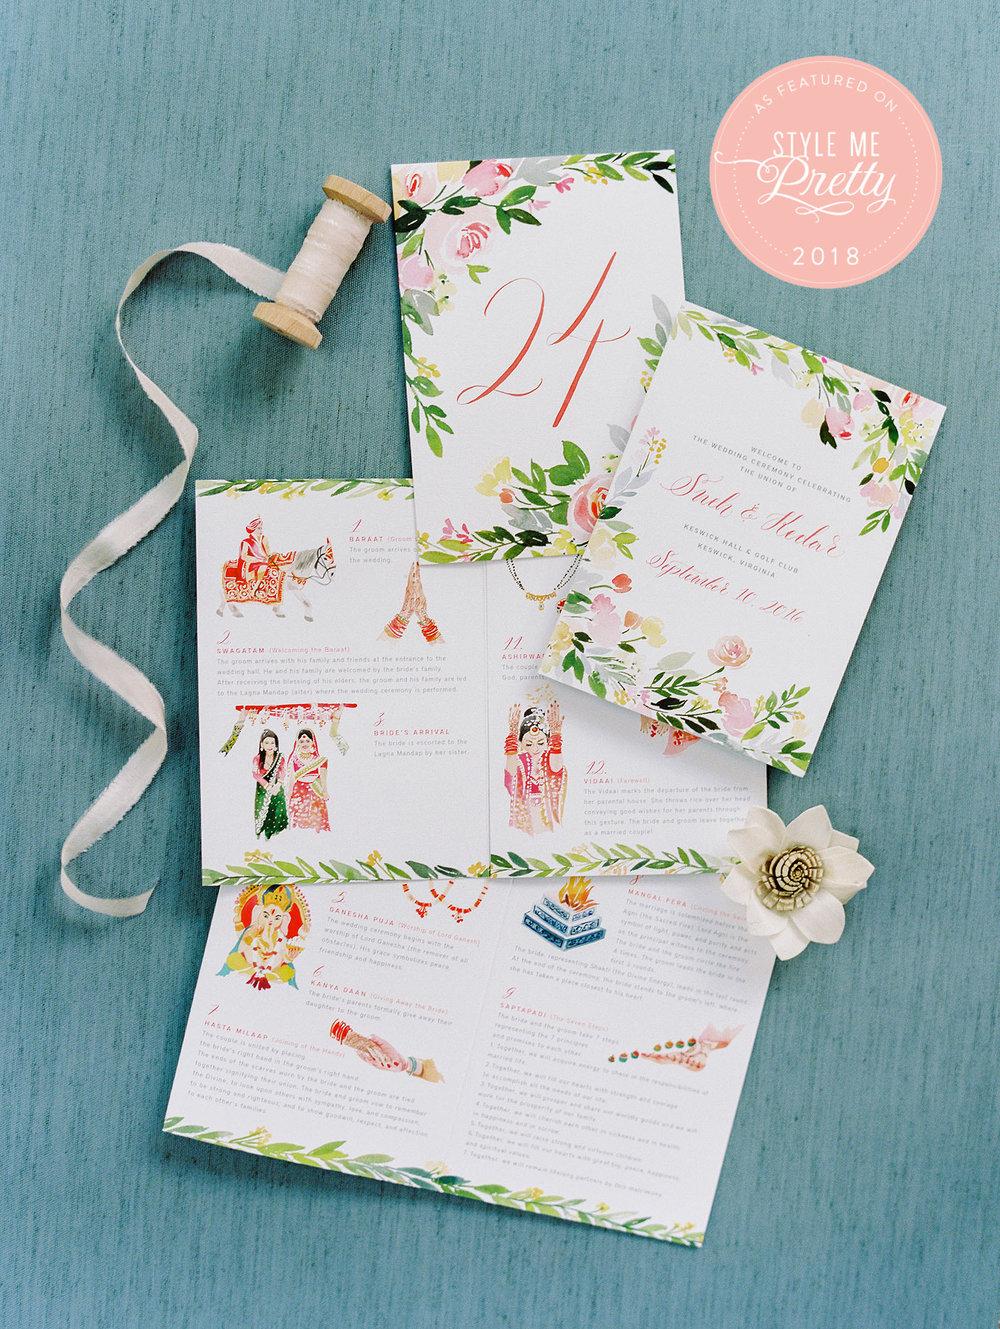 Yao Cheng Design- Wedding Program for Sneh + Kedar- Watercolor Wedding Stationery